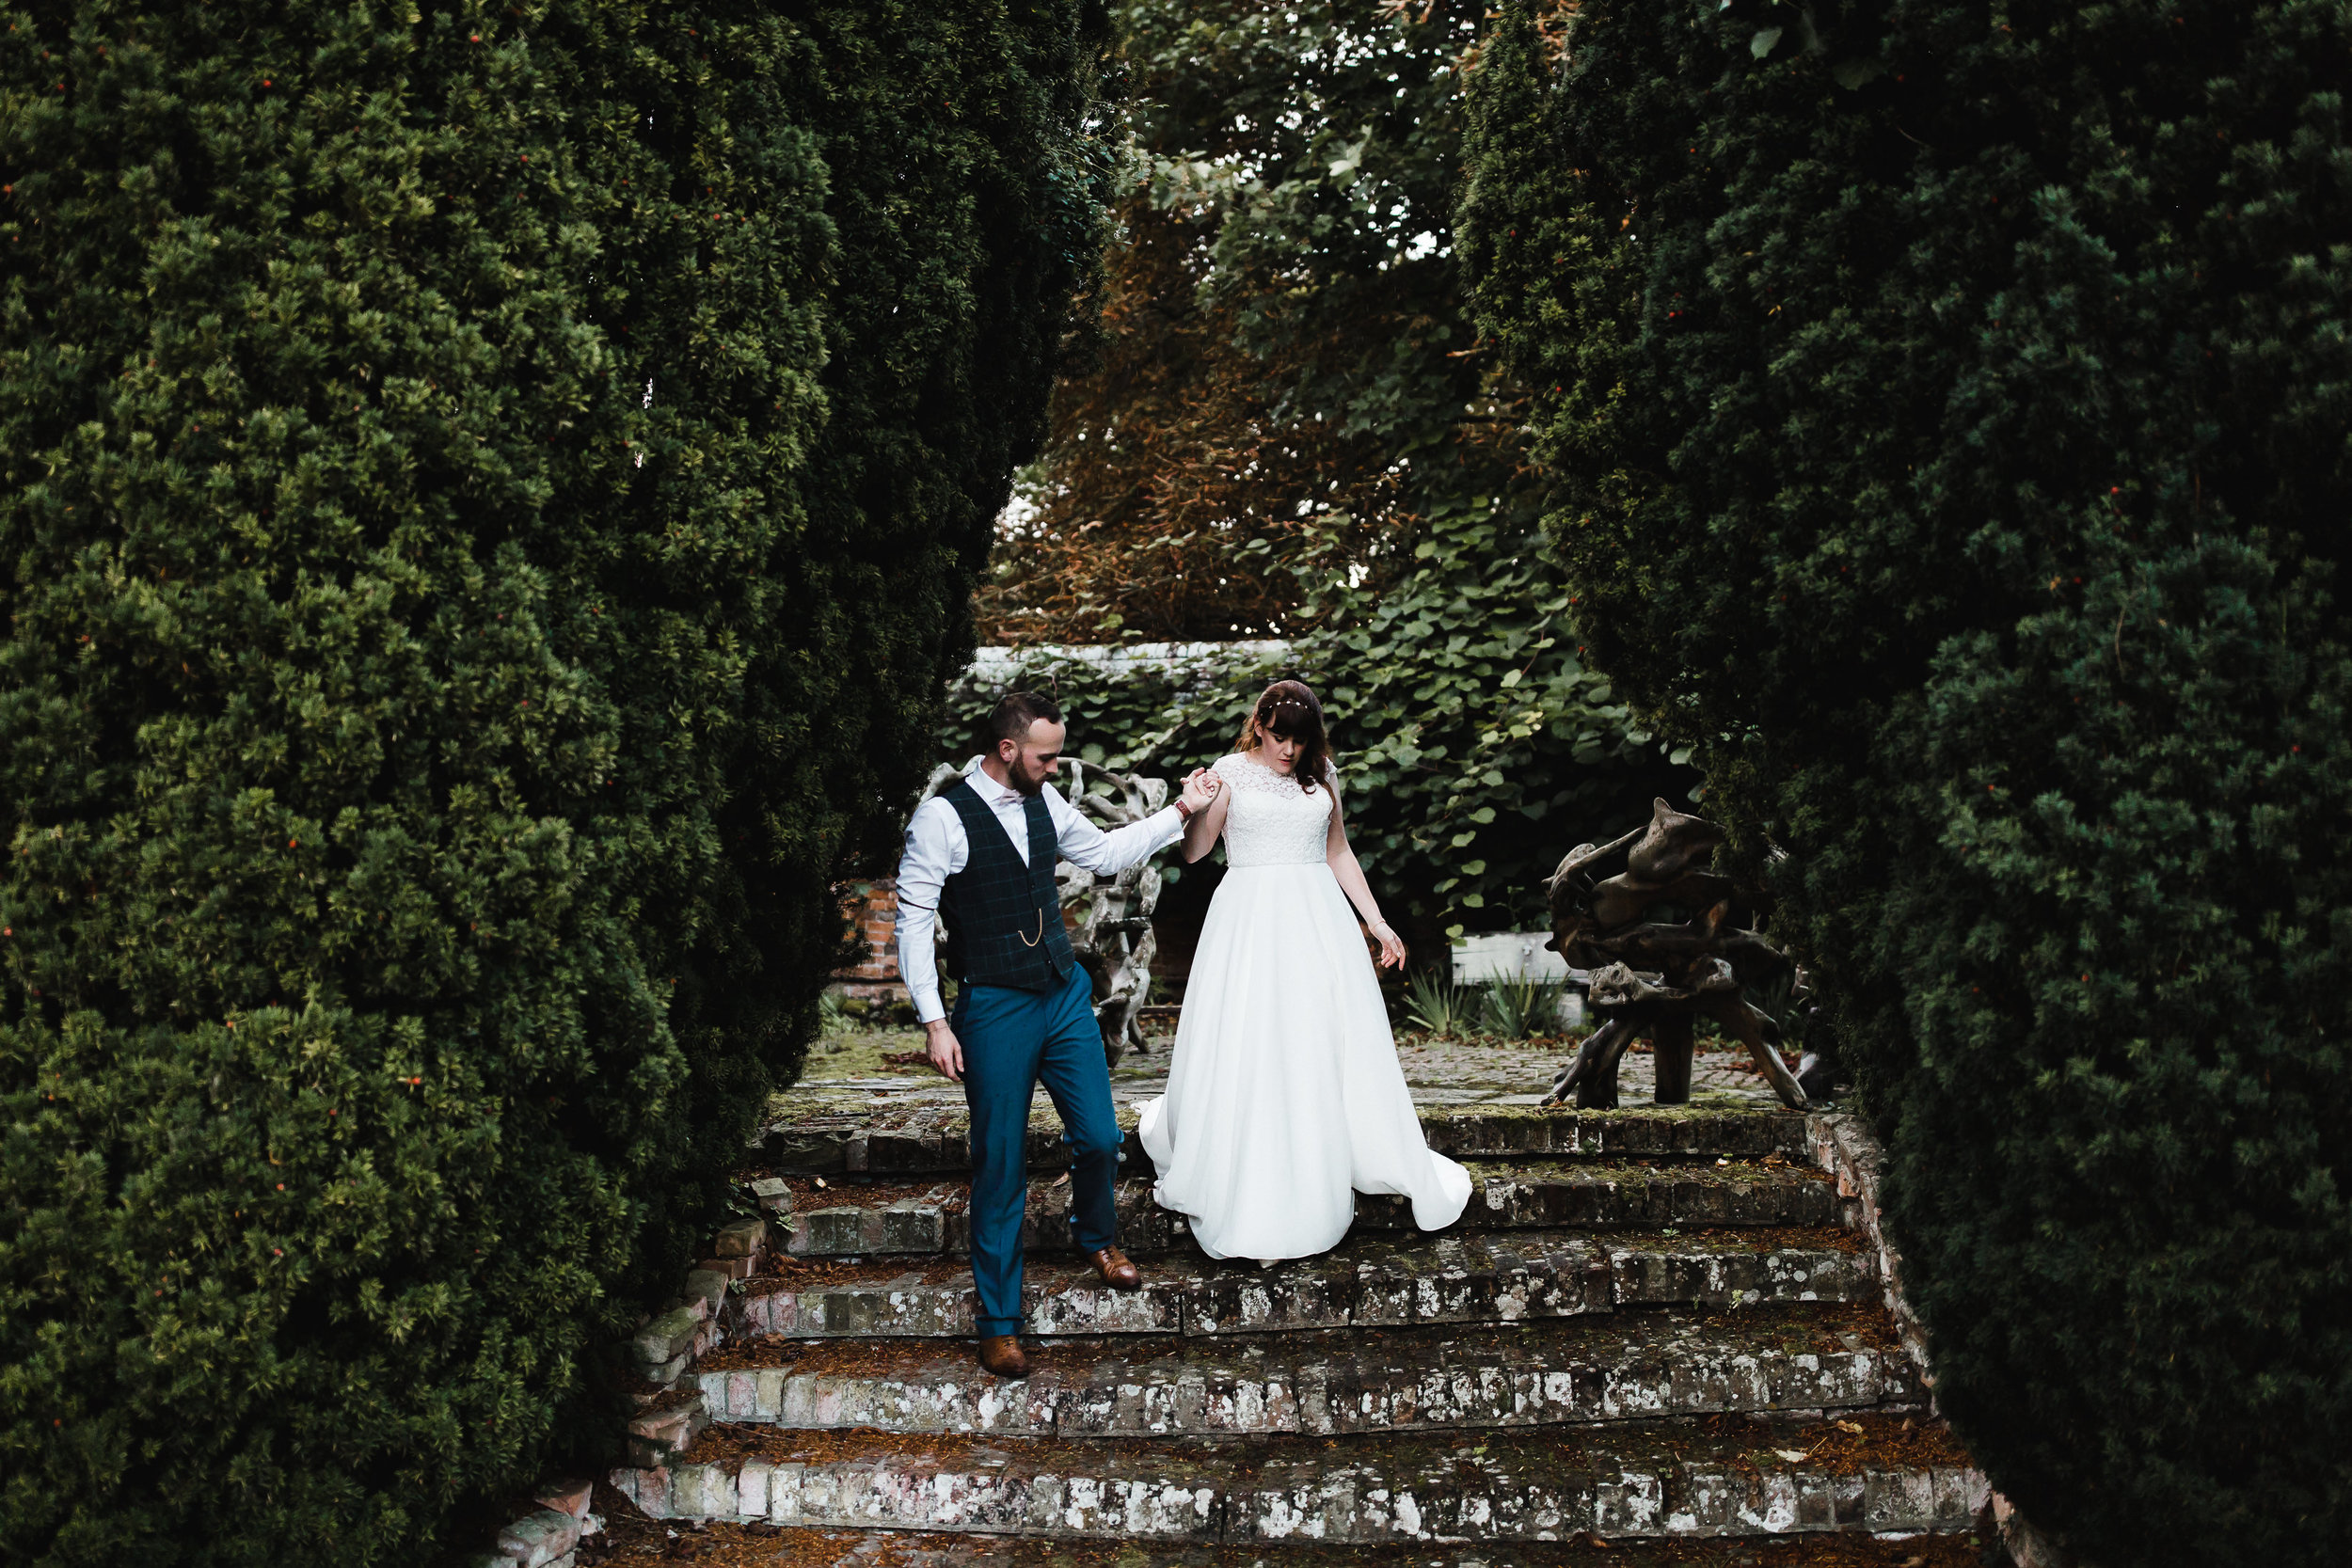 Nether_Wichendon_House_Wedding_084.jpg